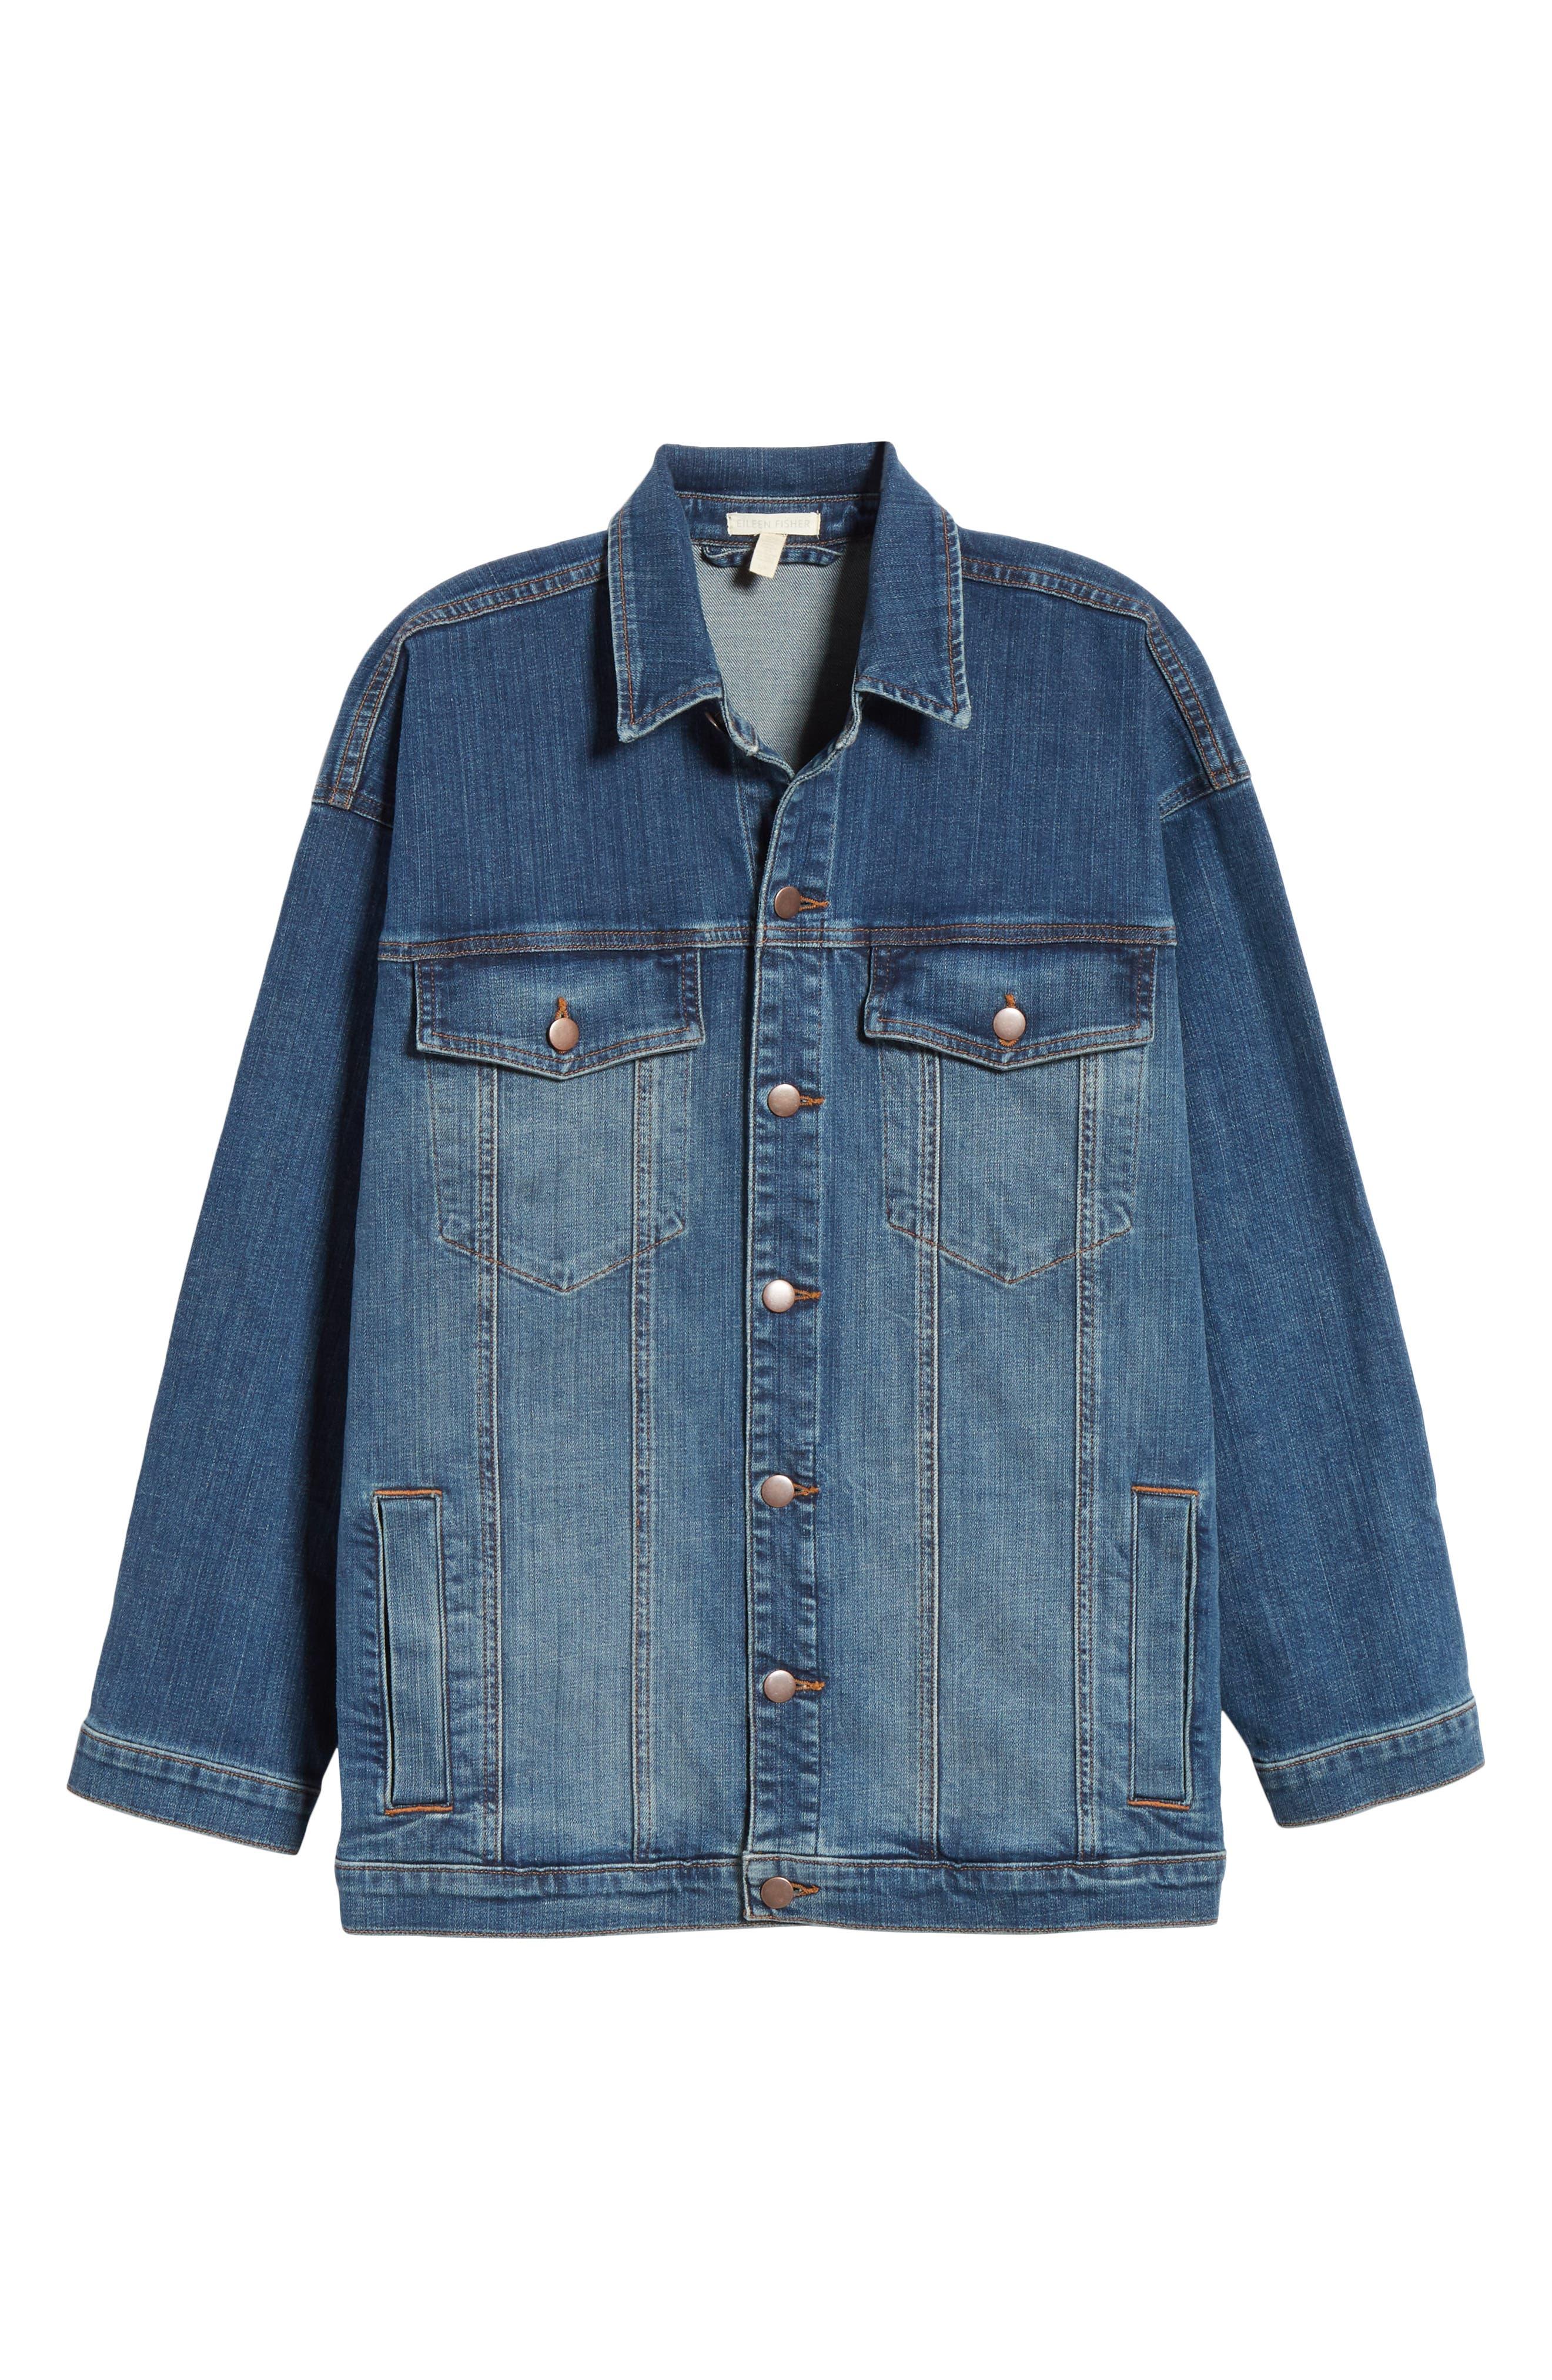 EILEEN FISHER, Oversize Stretch Organic Cotton Denim Jacket, Alternate thumbnail 6, color, AGED INDIGO